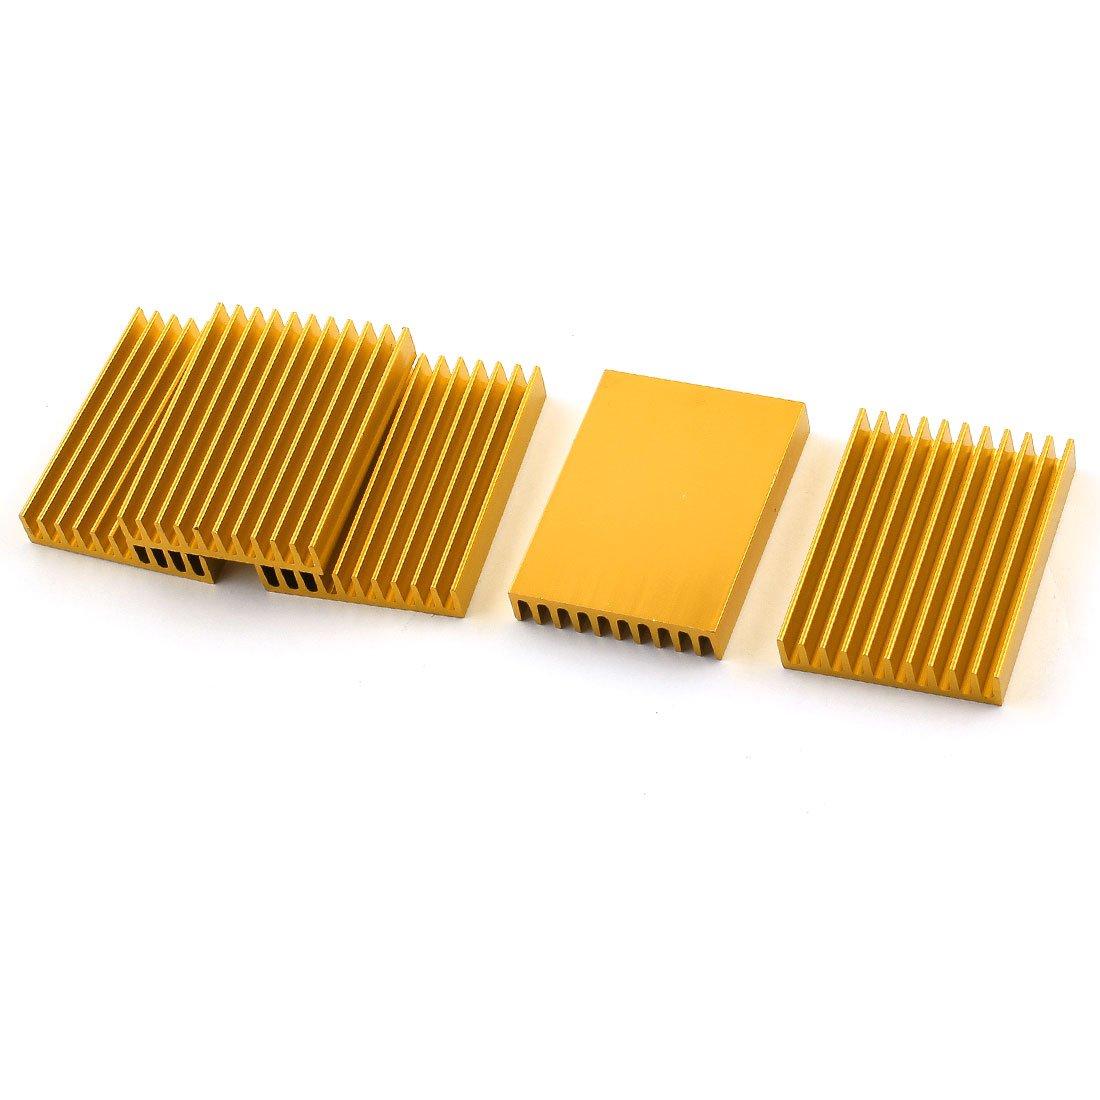 5Pcs 45x10x60mm Aluminium Heatsink Heat Diffuse Cooling Cooler Fin dhl ems 2 lots new omron proximity switch e2em x8c1 e2emx8c1 a2